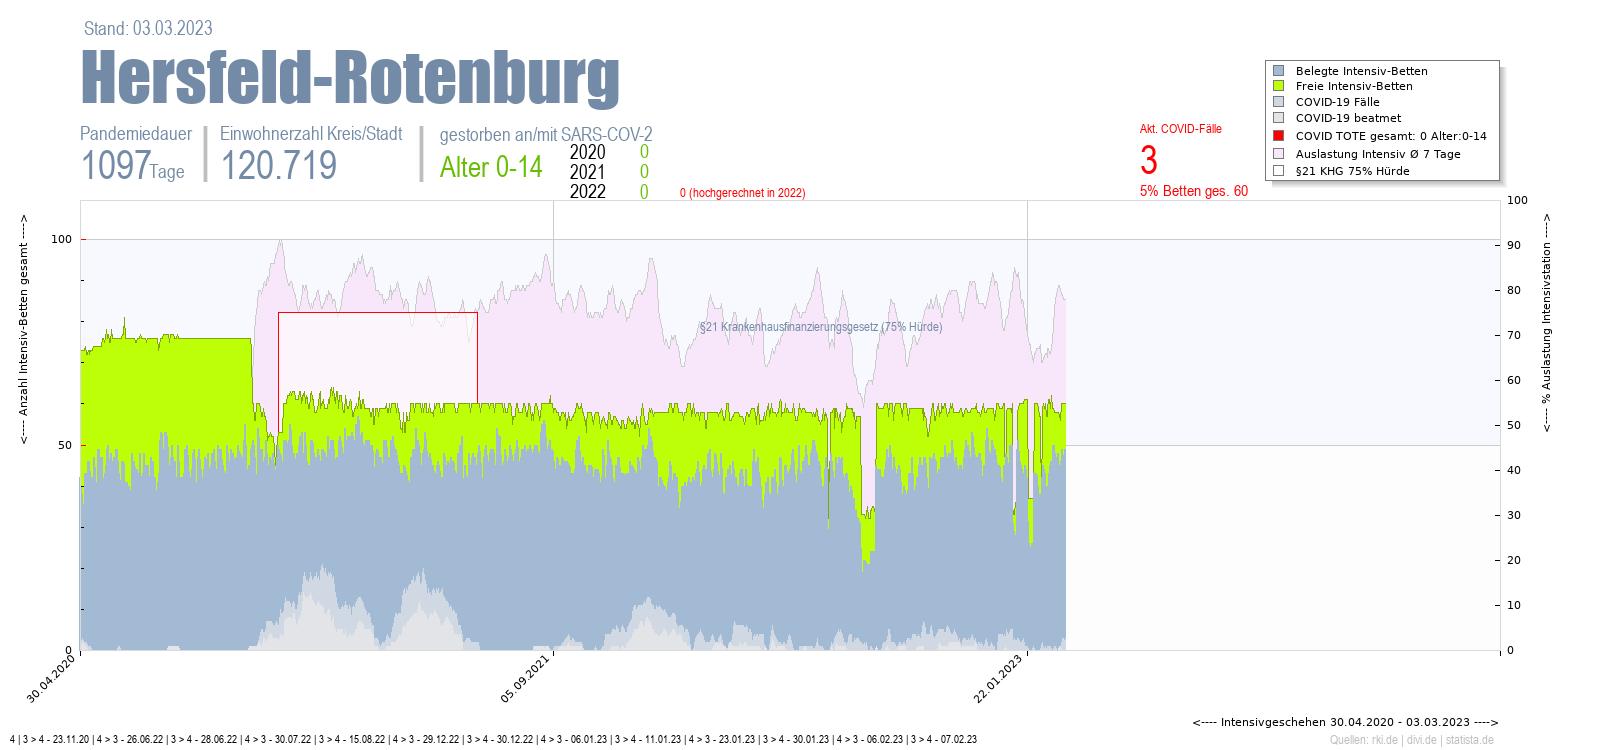 Intensivstation Auslastung Hersfeld-Rotenburg Alter 0-4